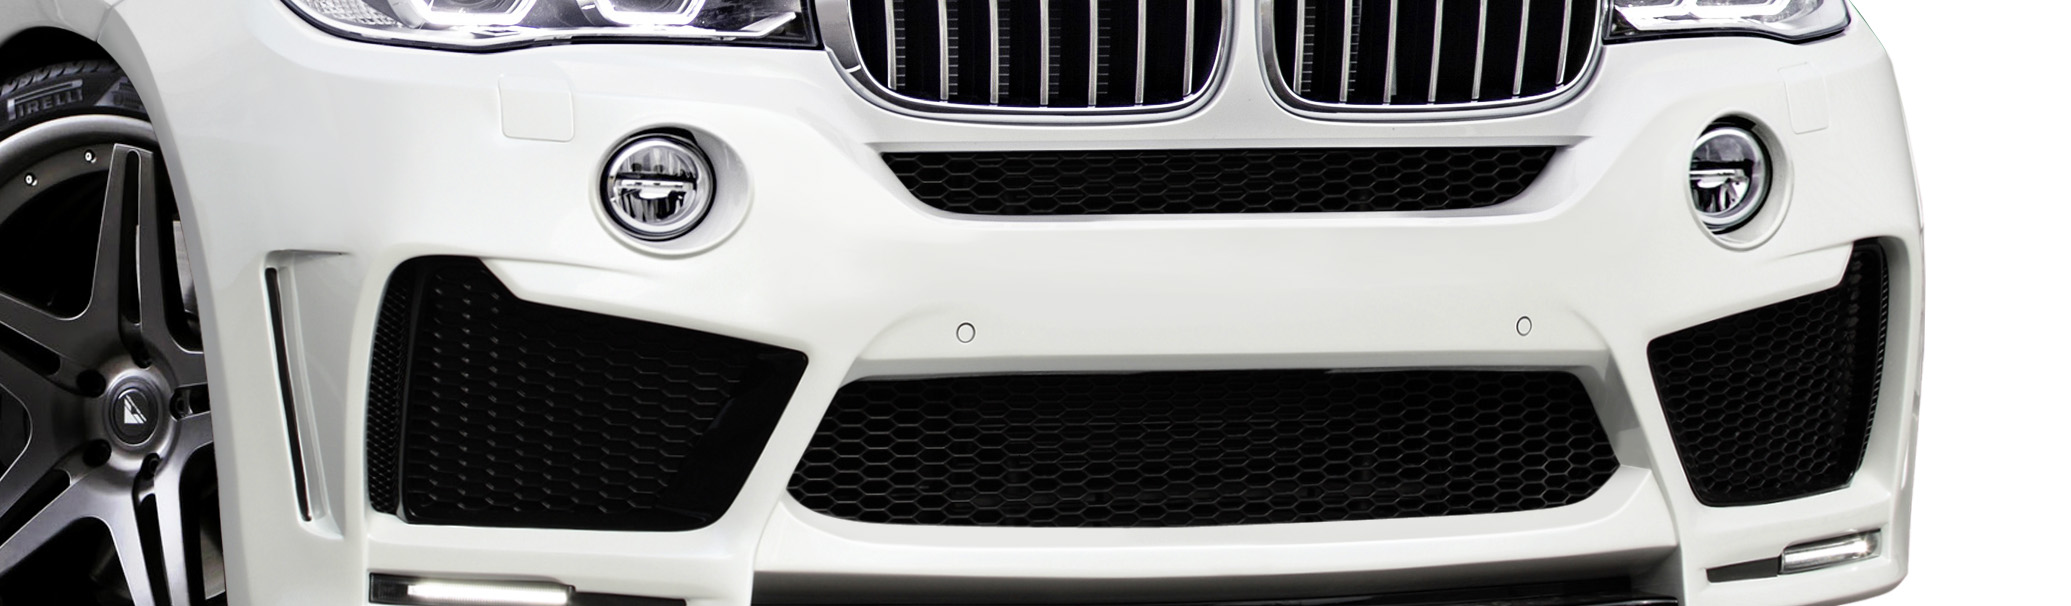 2014-2018 BMW X5 F15 AF-1 Wide Body Front Bumper Air Intake ( GFK ) - 2 Piece (S)